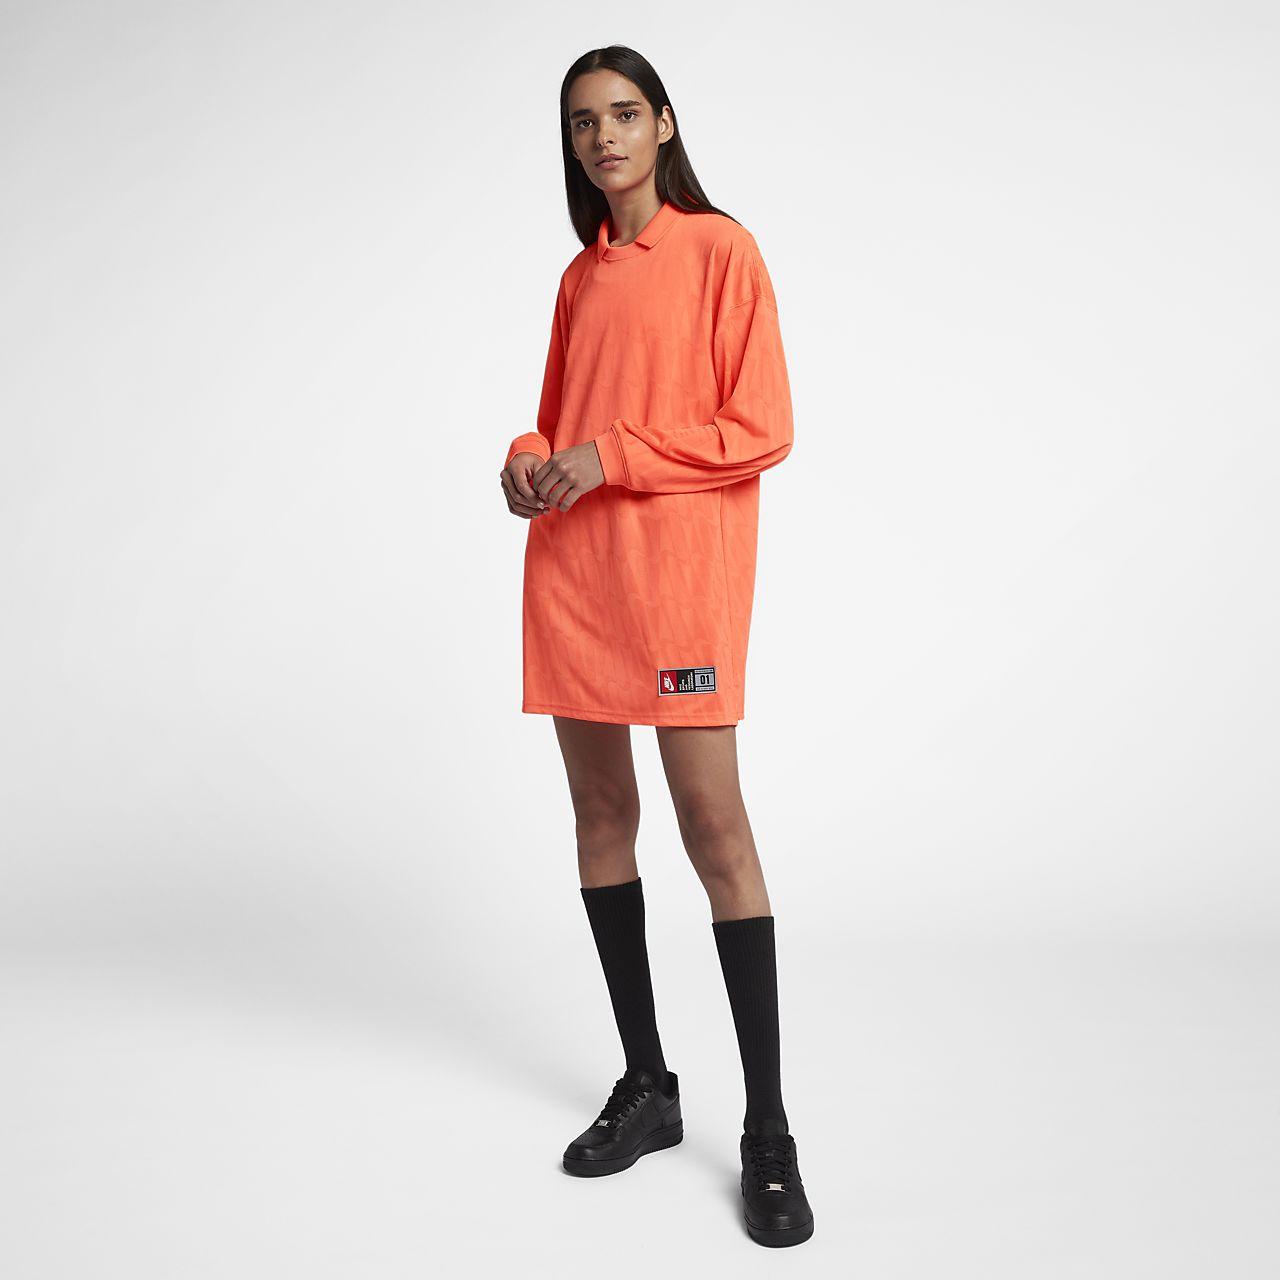 NikeLab Women's Loose Fit Top